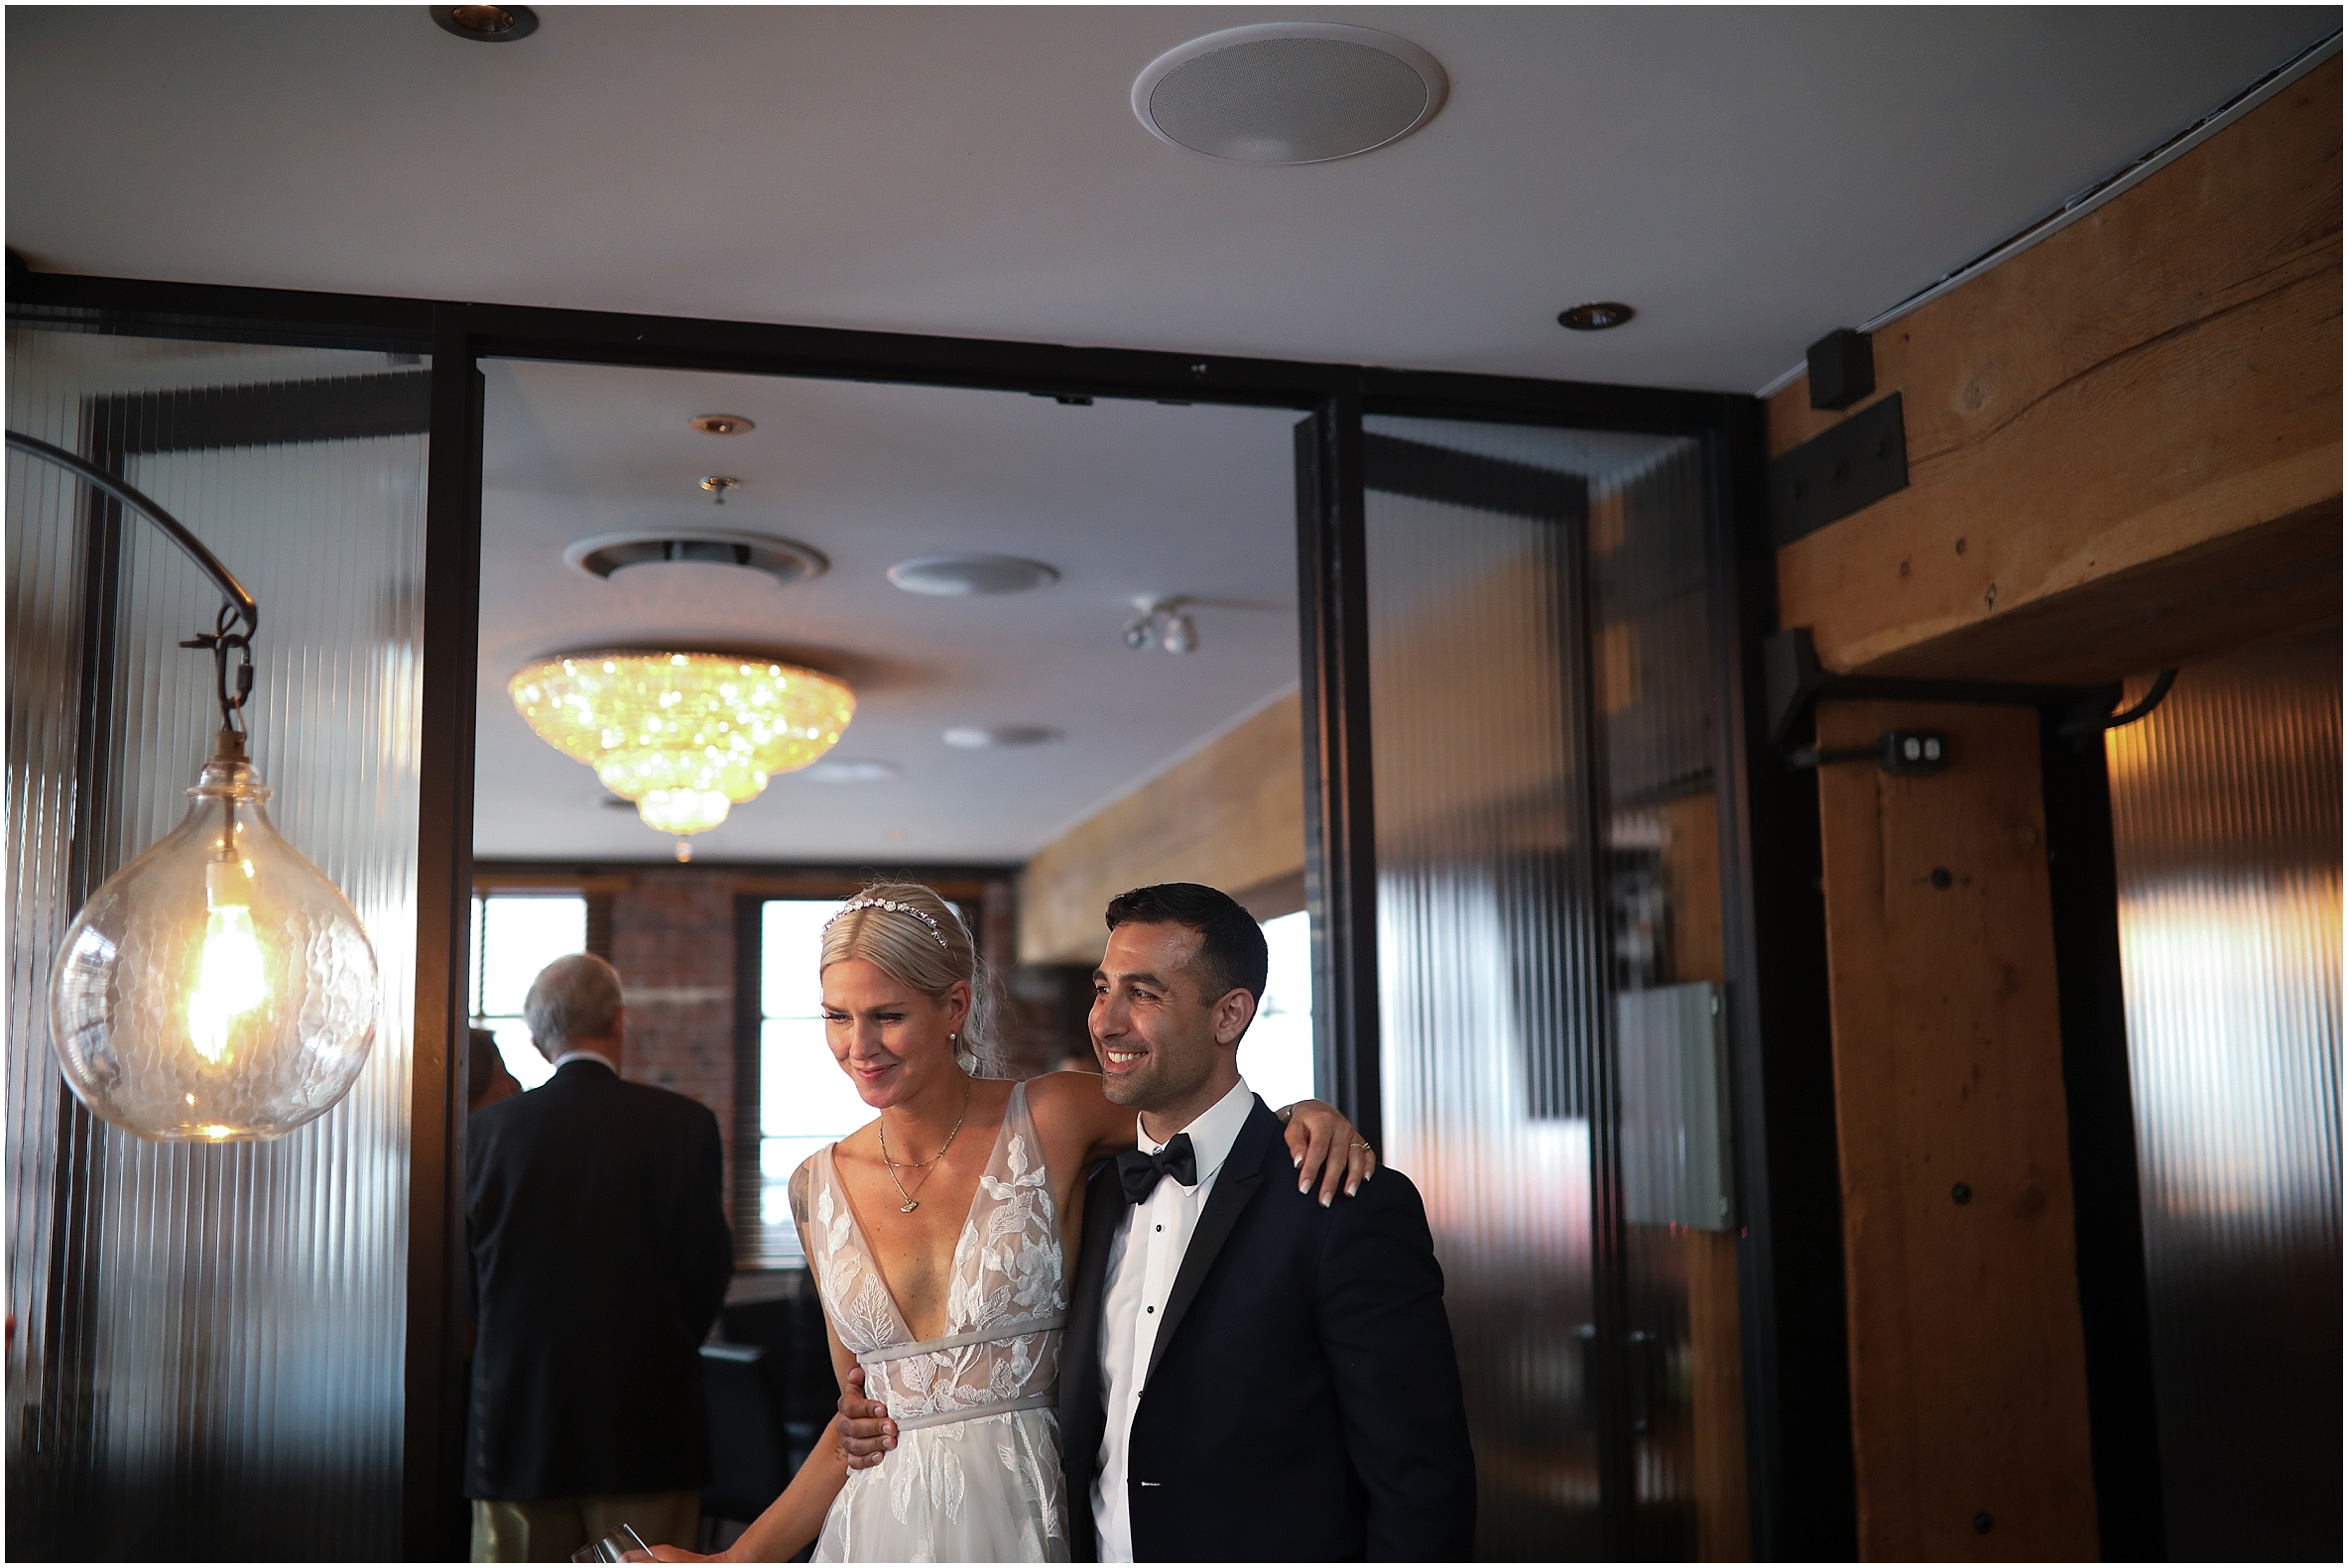 vancouver-wedding-photographer-the-loft-earls-yaletown_0025.jpg